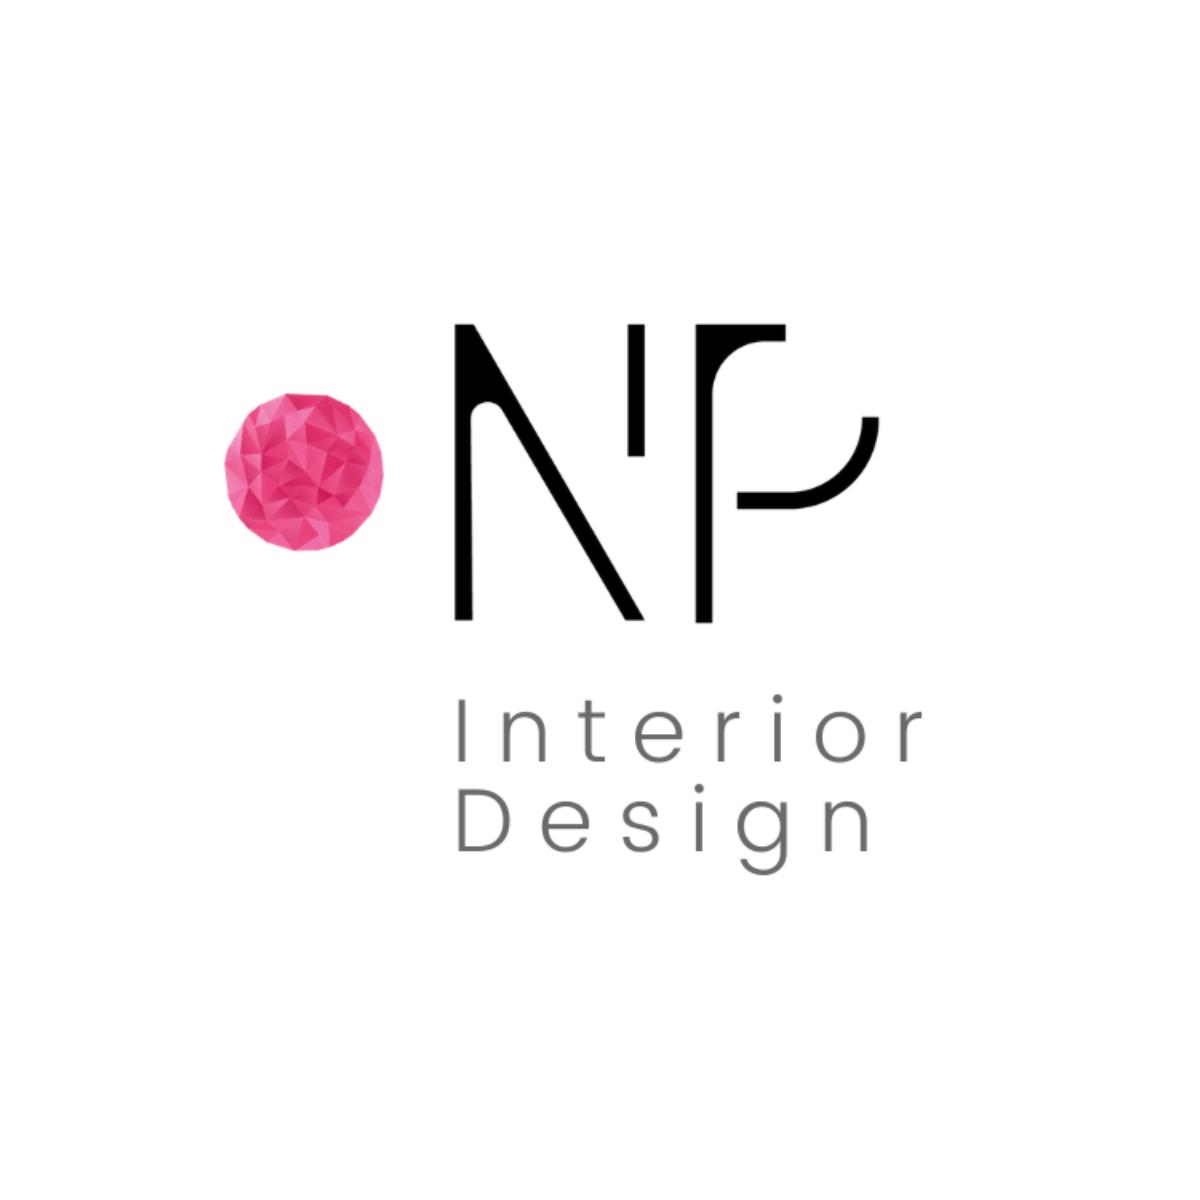 Projeto Clínica Odontológica T1 Vigilância Sanitária ANVISA_NP Interior Design (9)